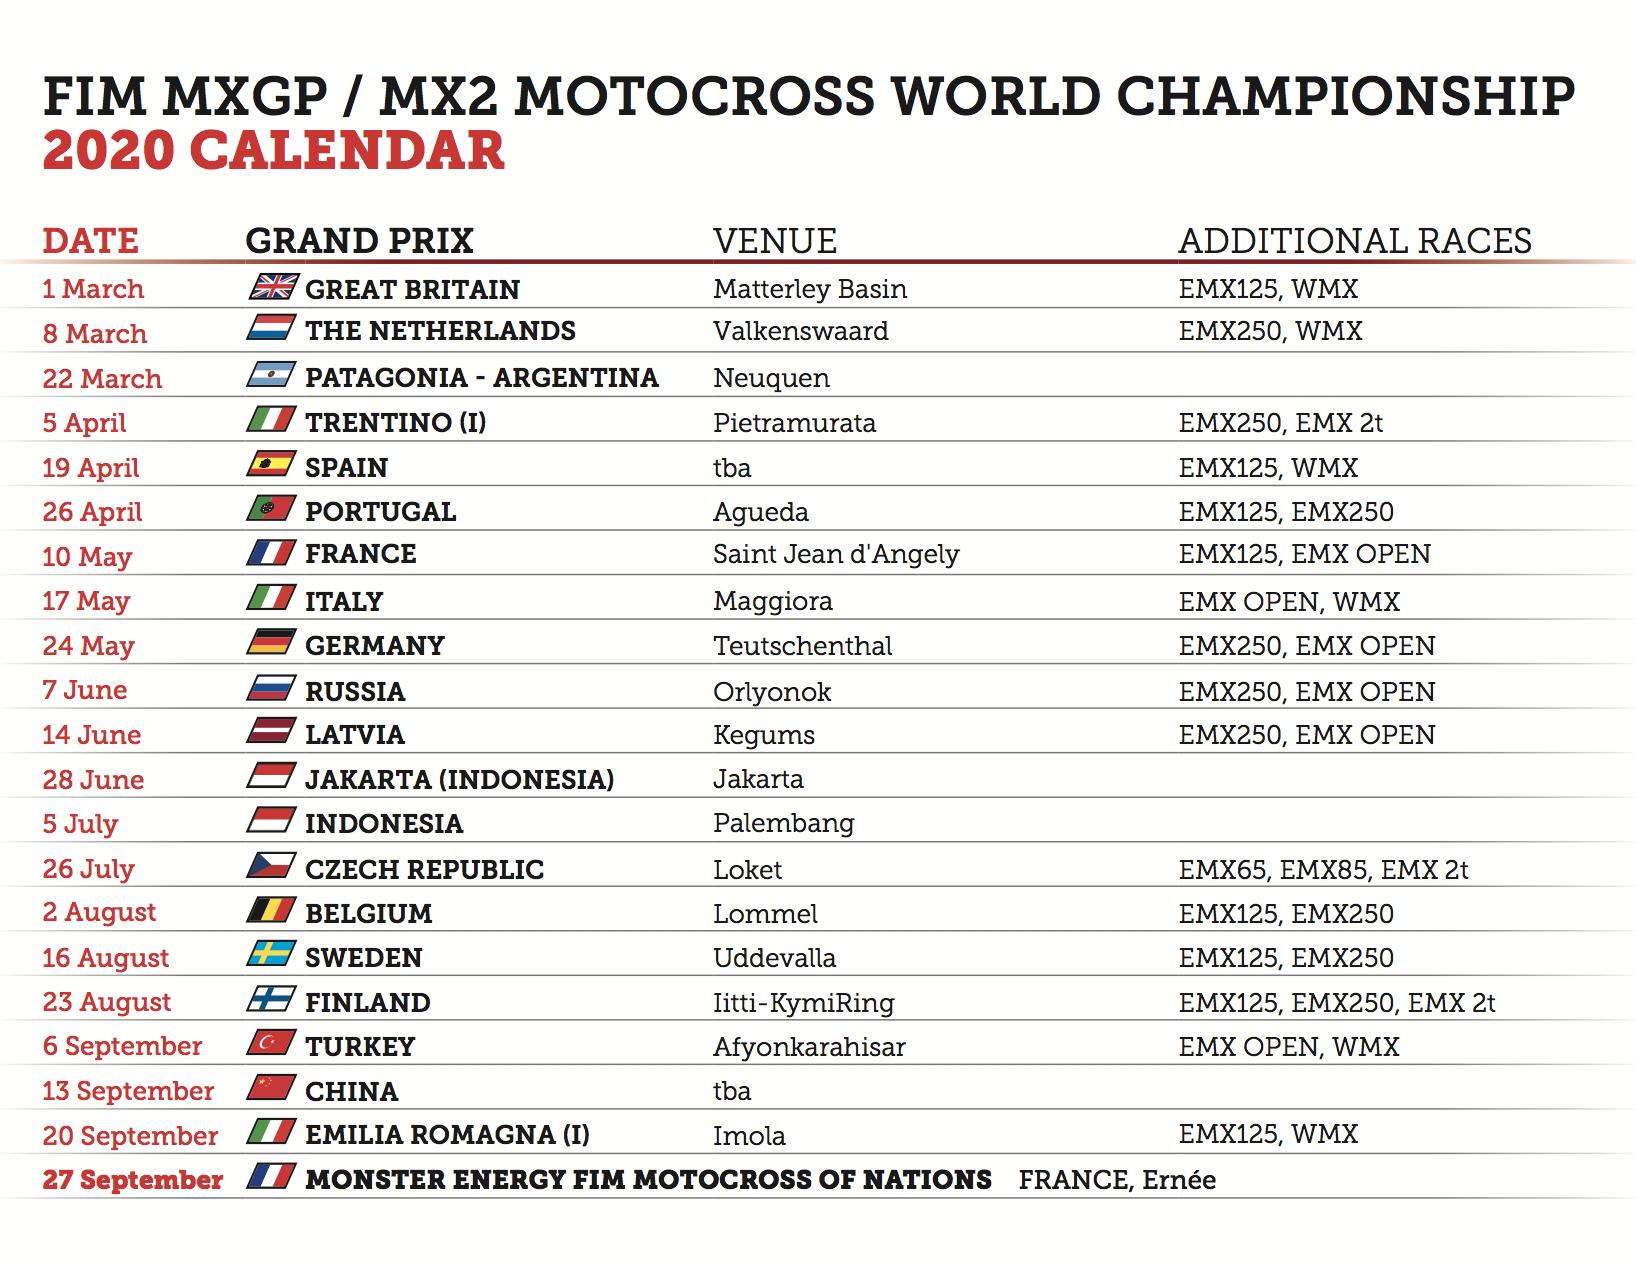 Can Calendrier 2020.2020 Fim Motocross World Championship Official Calendar Mxgp